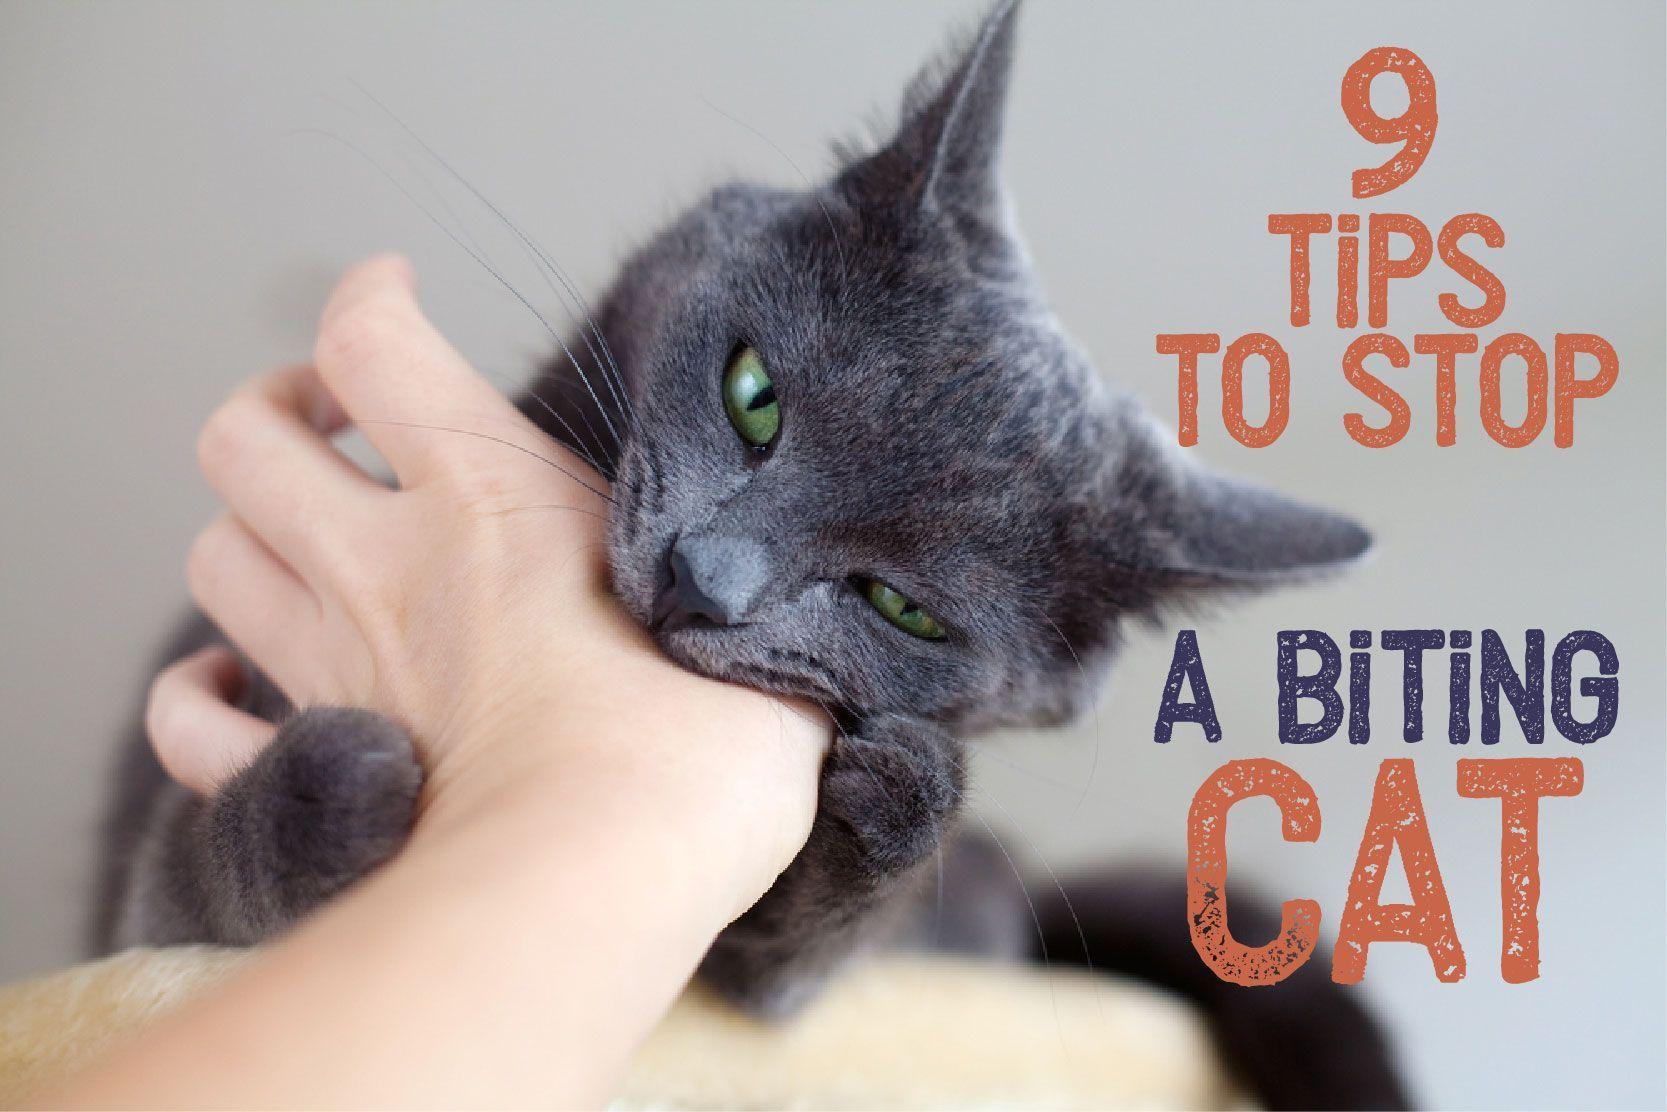 9 tips to stop a biting cat catbehaviorbiting cat